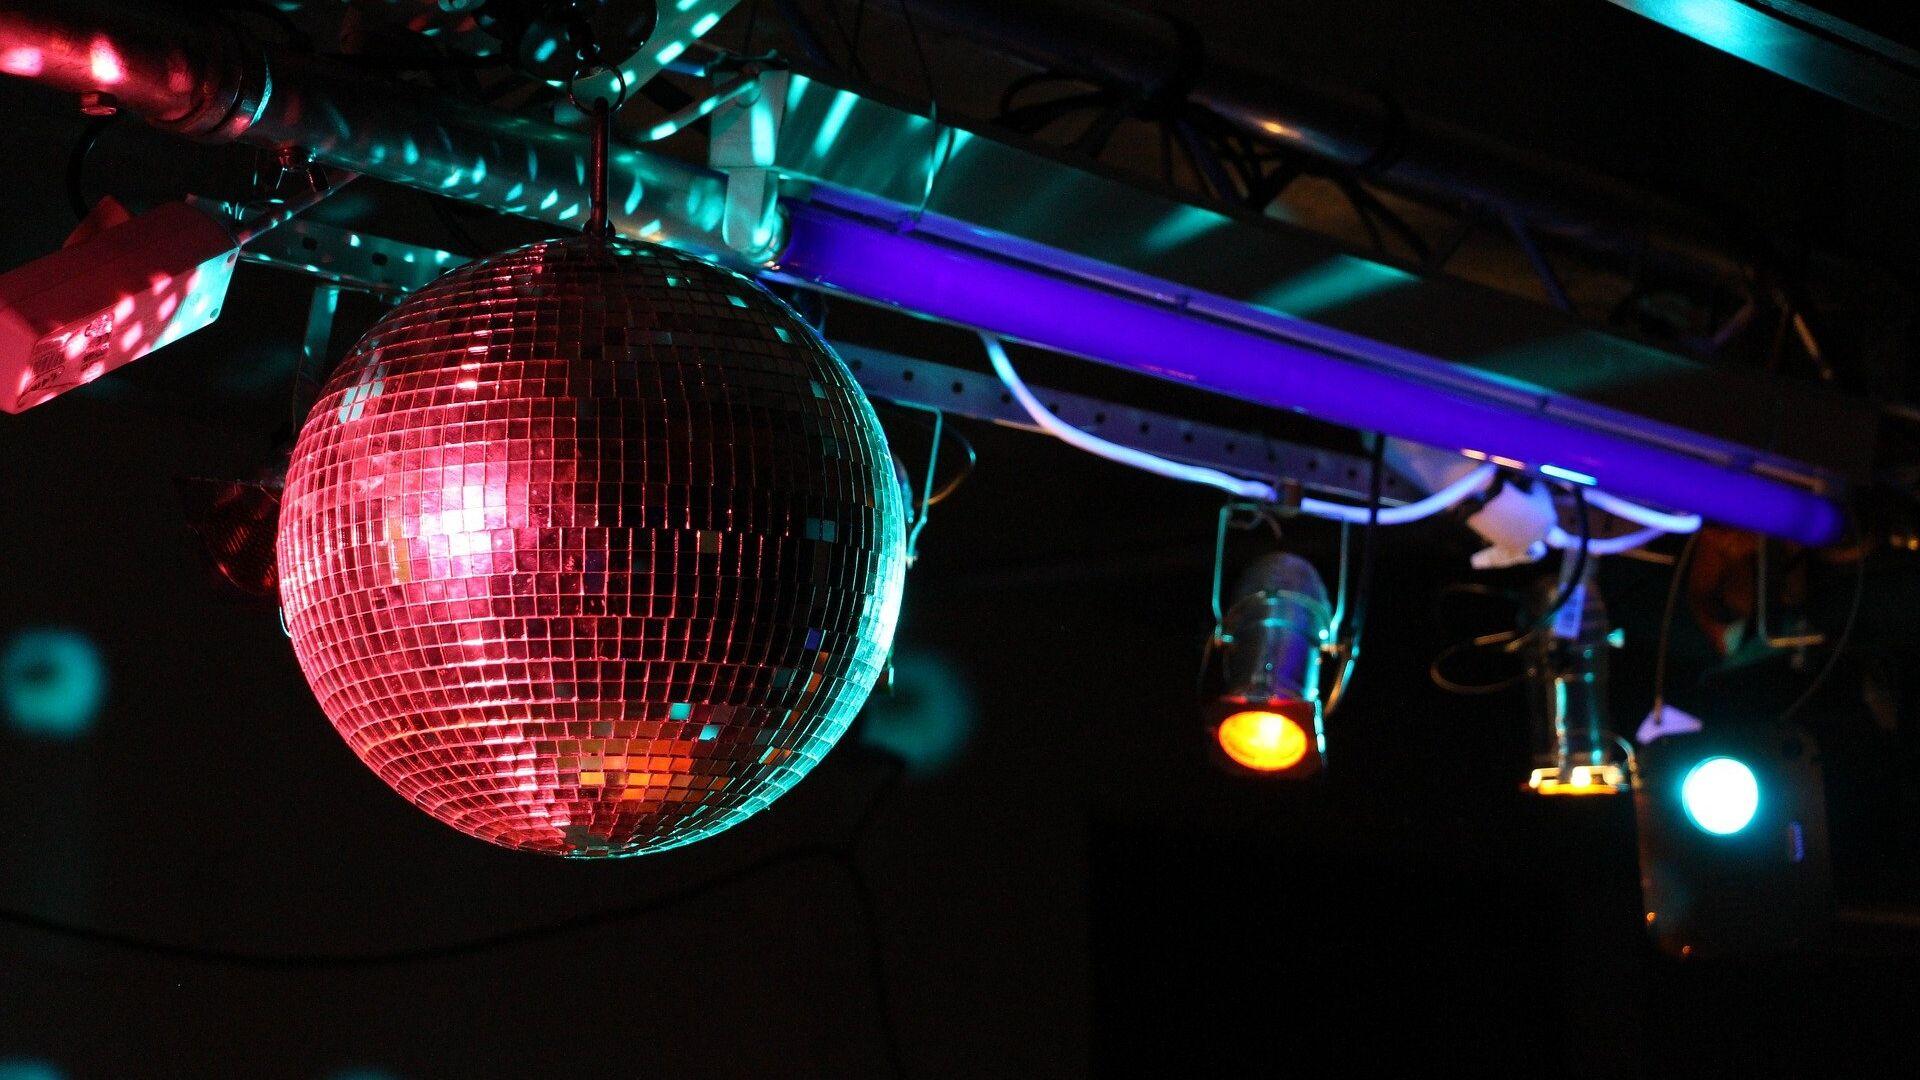 Luces de una discoteca - Sputnik Mundo, 1920, 01.10.2021